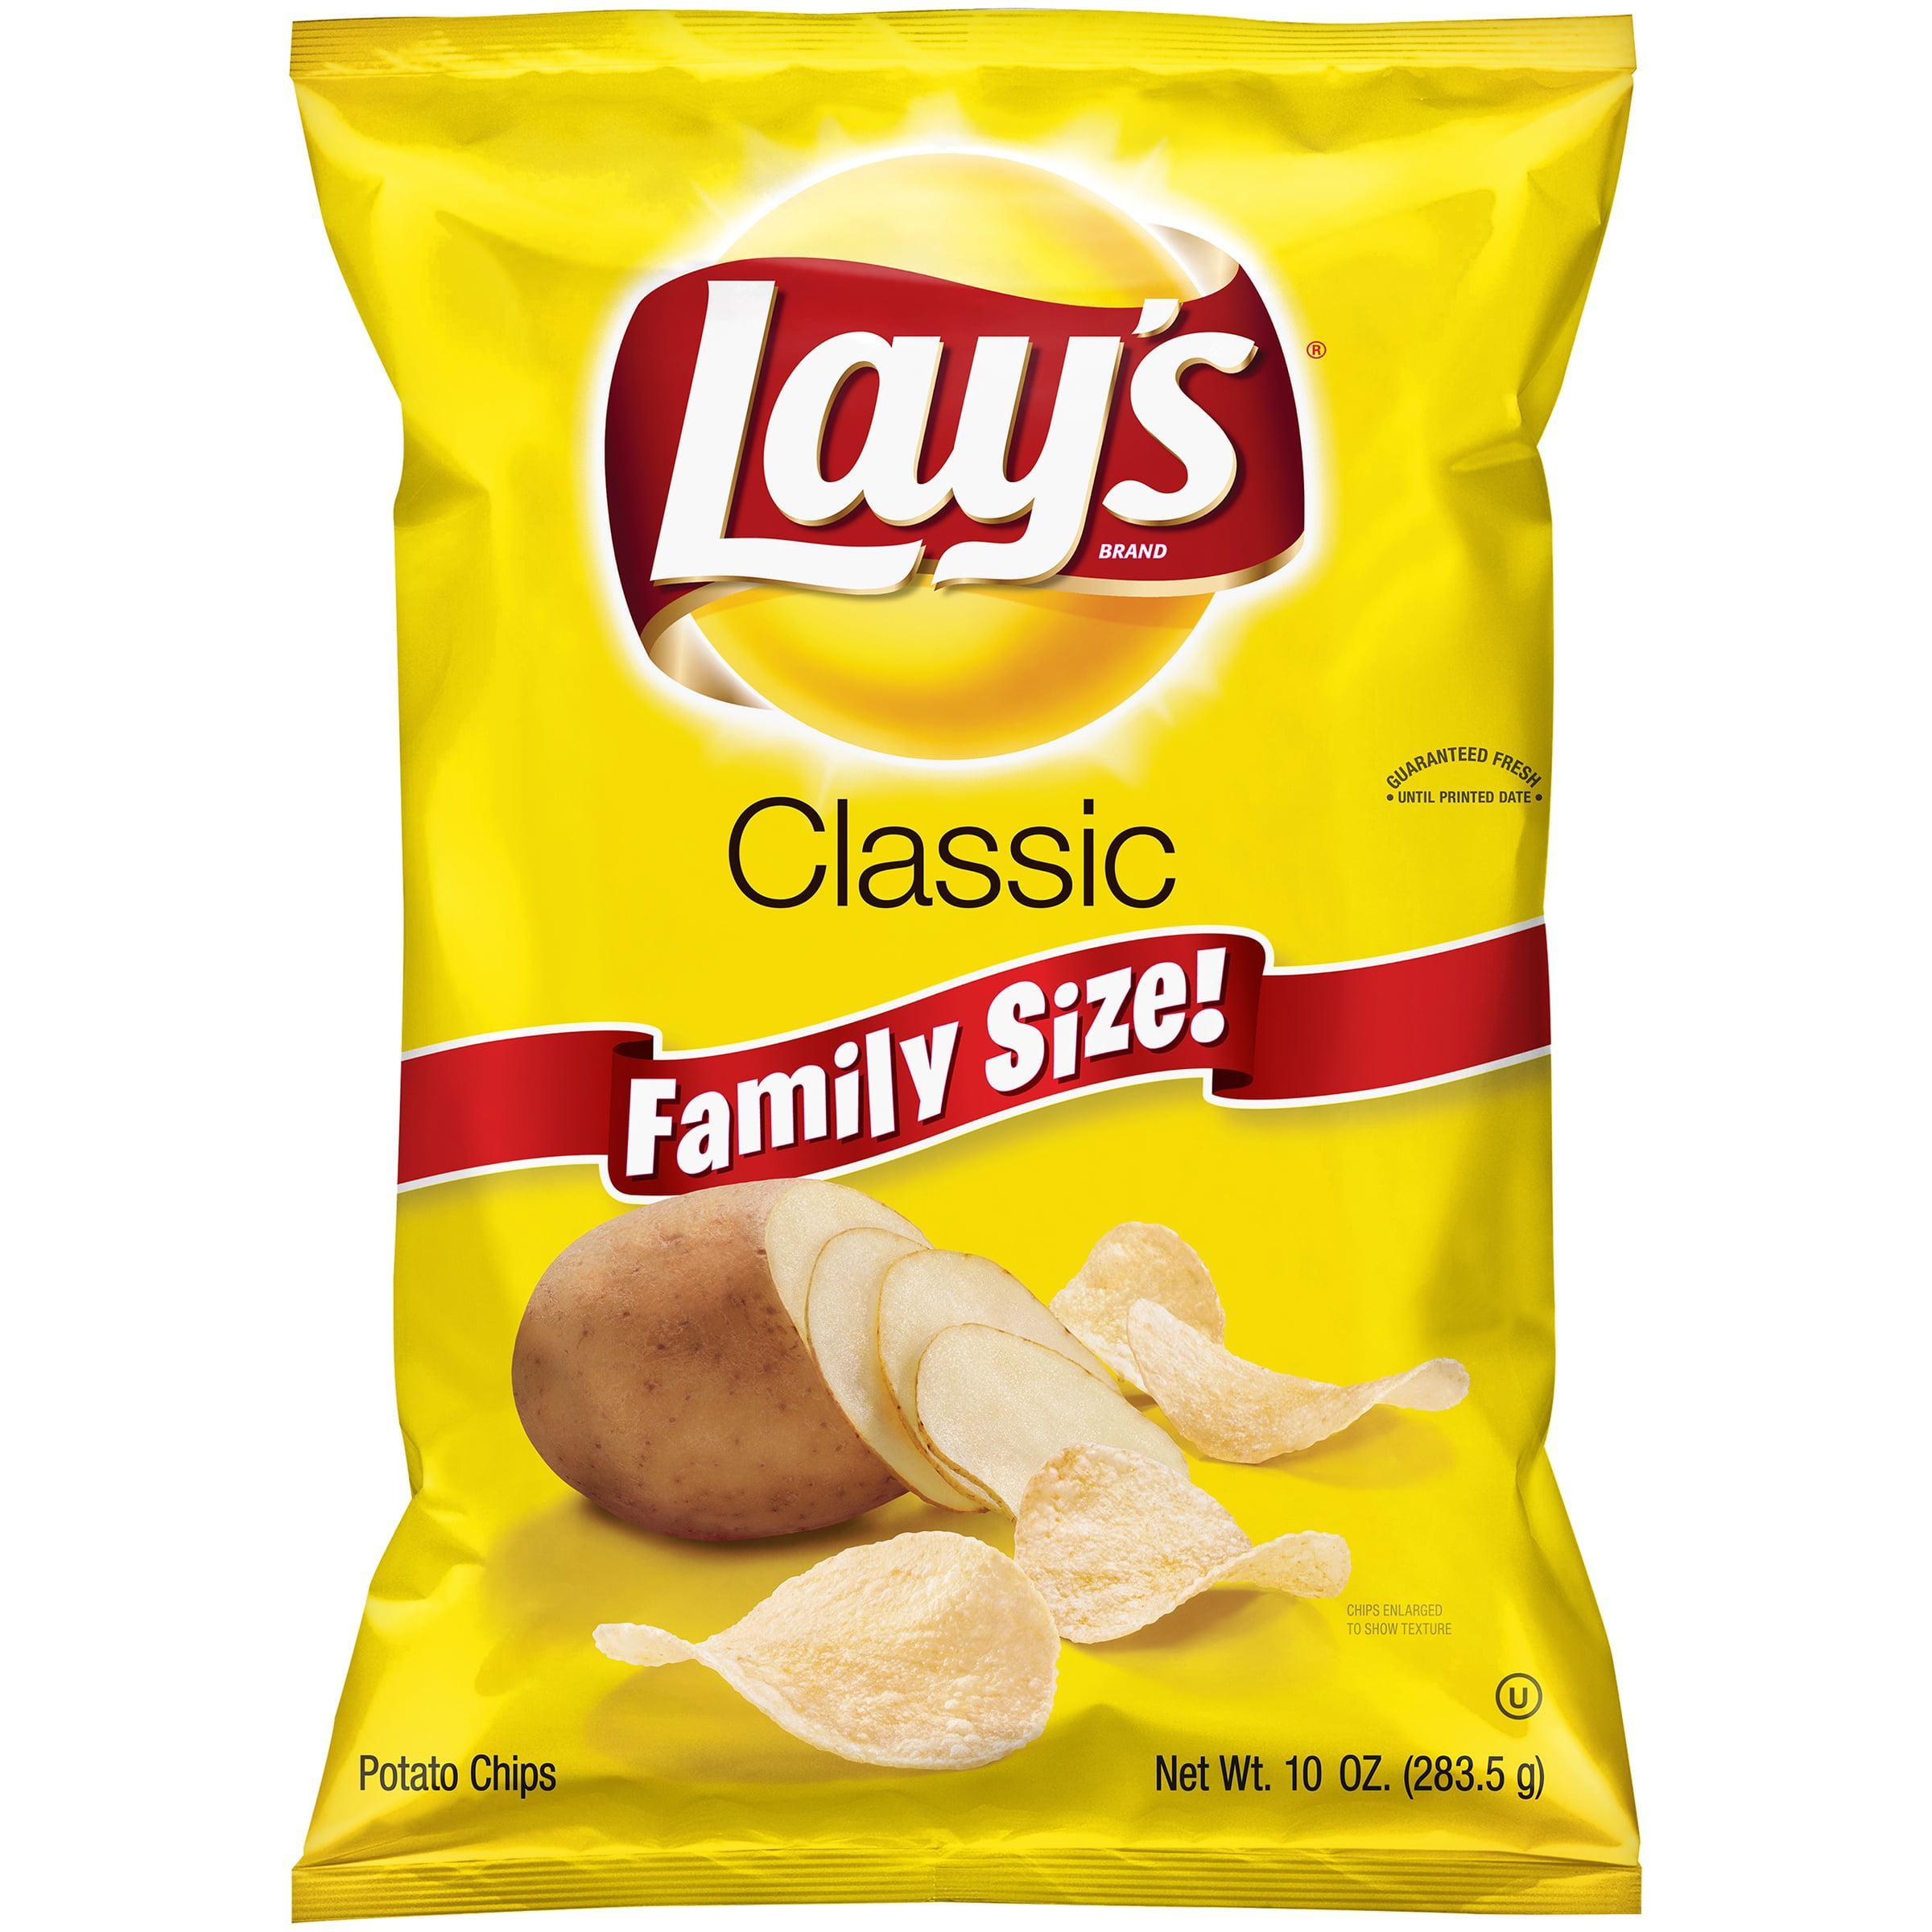 Lay's Classic Potato Chips, 10 oz. Bag